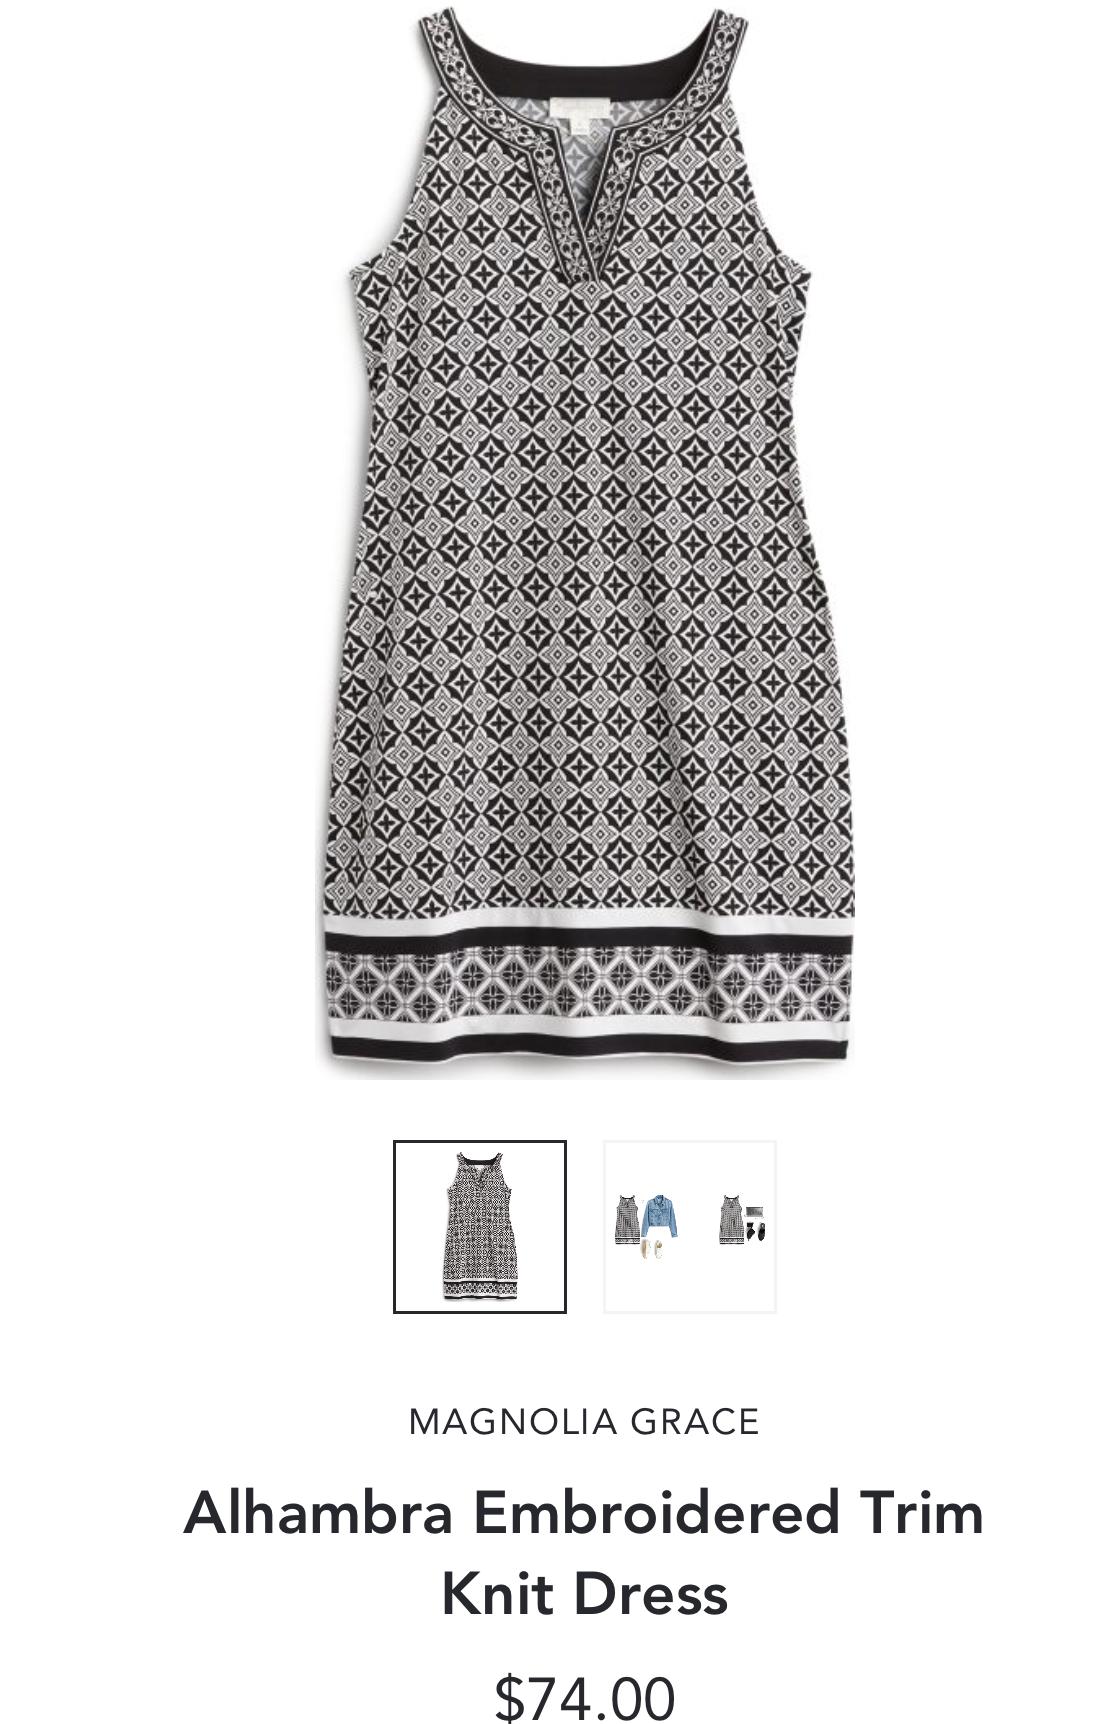 Stitch Fix Magnolia Grace Alhambra Embroidered Trim Knit Dress